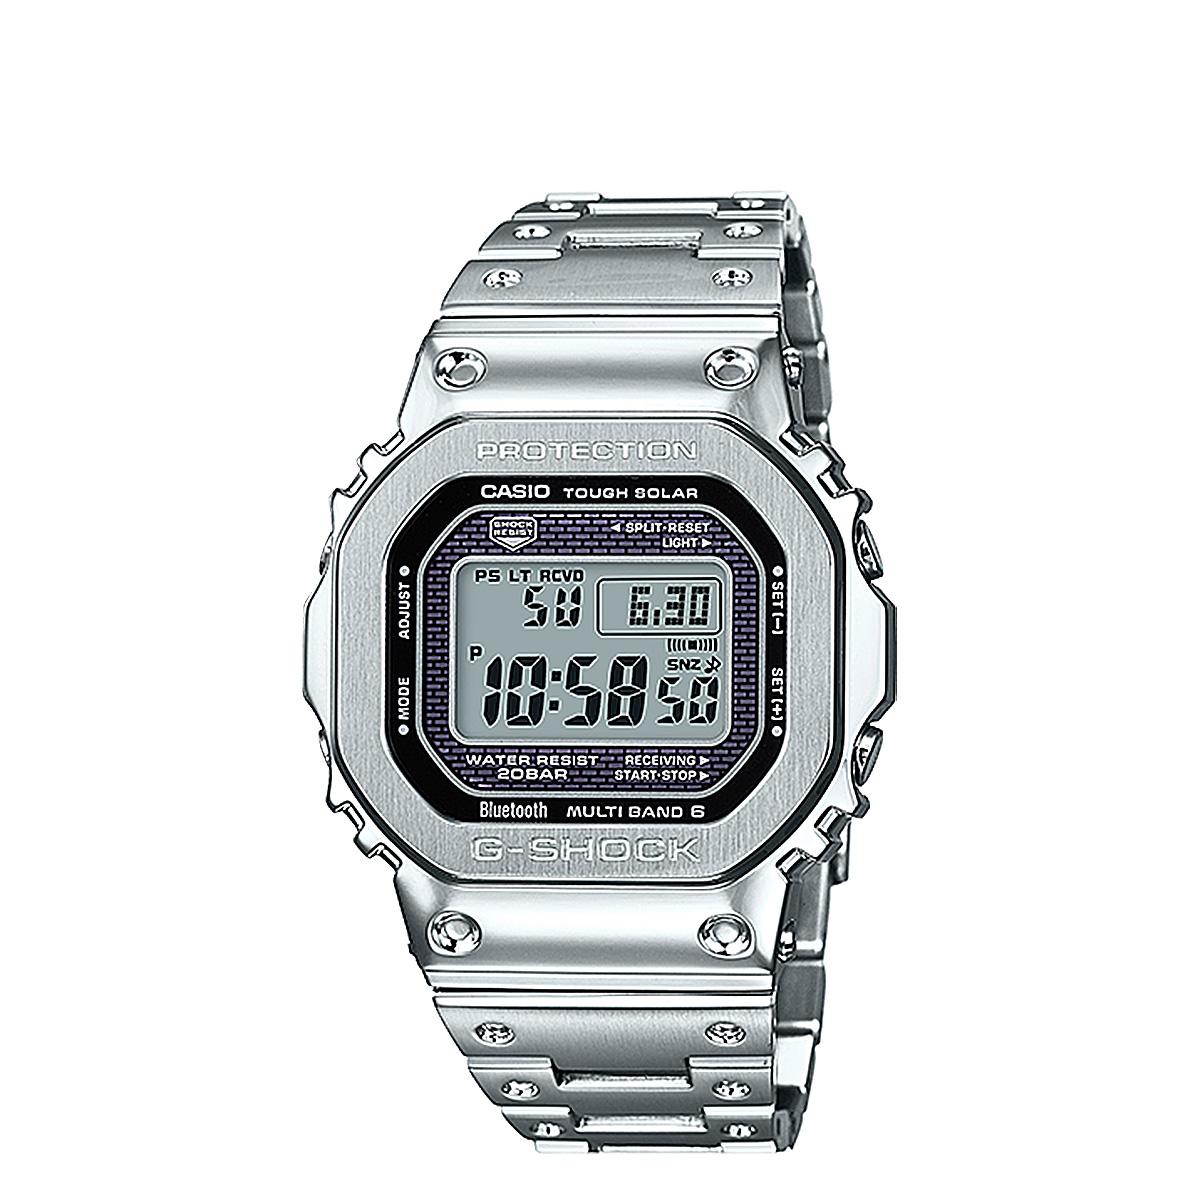 CASIO G-SHOCK カシオ 腕時計 GMW-B5000D-1JF ORIGIN 35周年 メンズ レディース シルバー